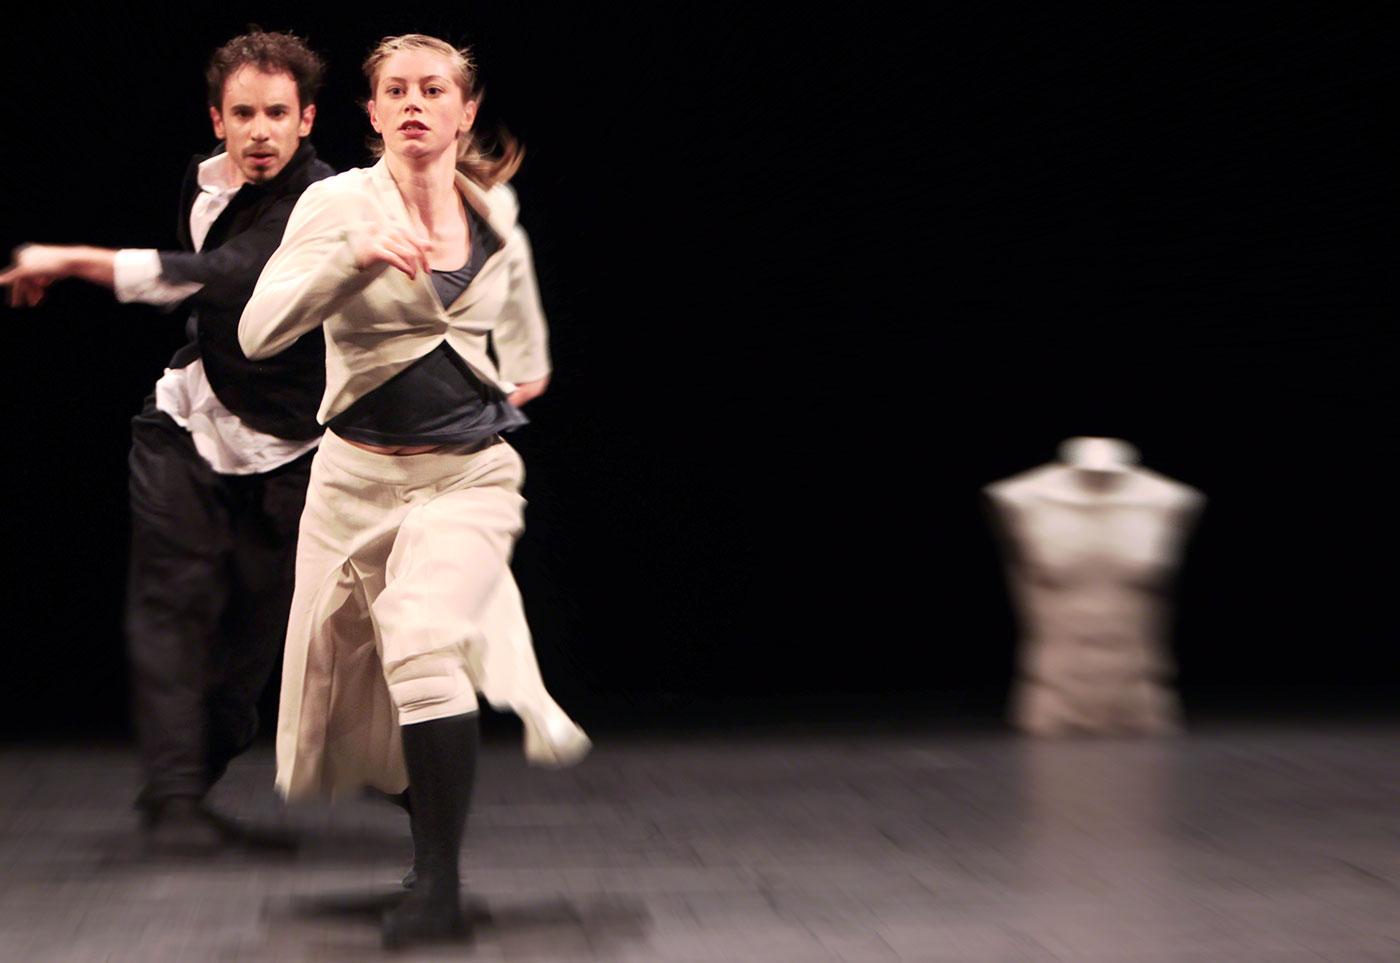 «Suits» im Rahmen von «Tanz 9: Fine Lines» im April 2012: Rachel Lawrence mit ihrem Partner Luca Signoretti.